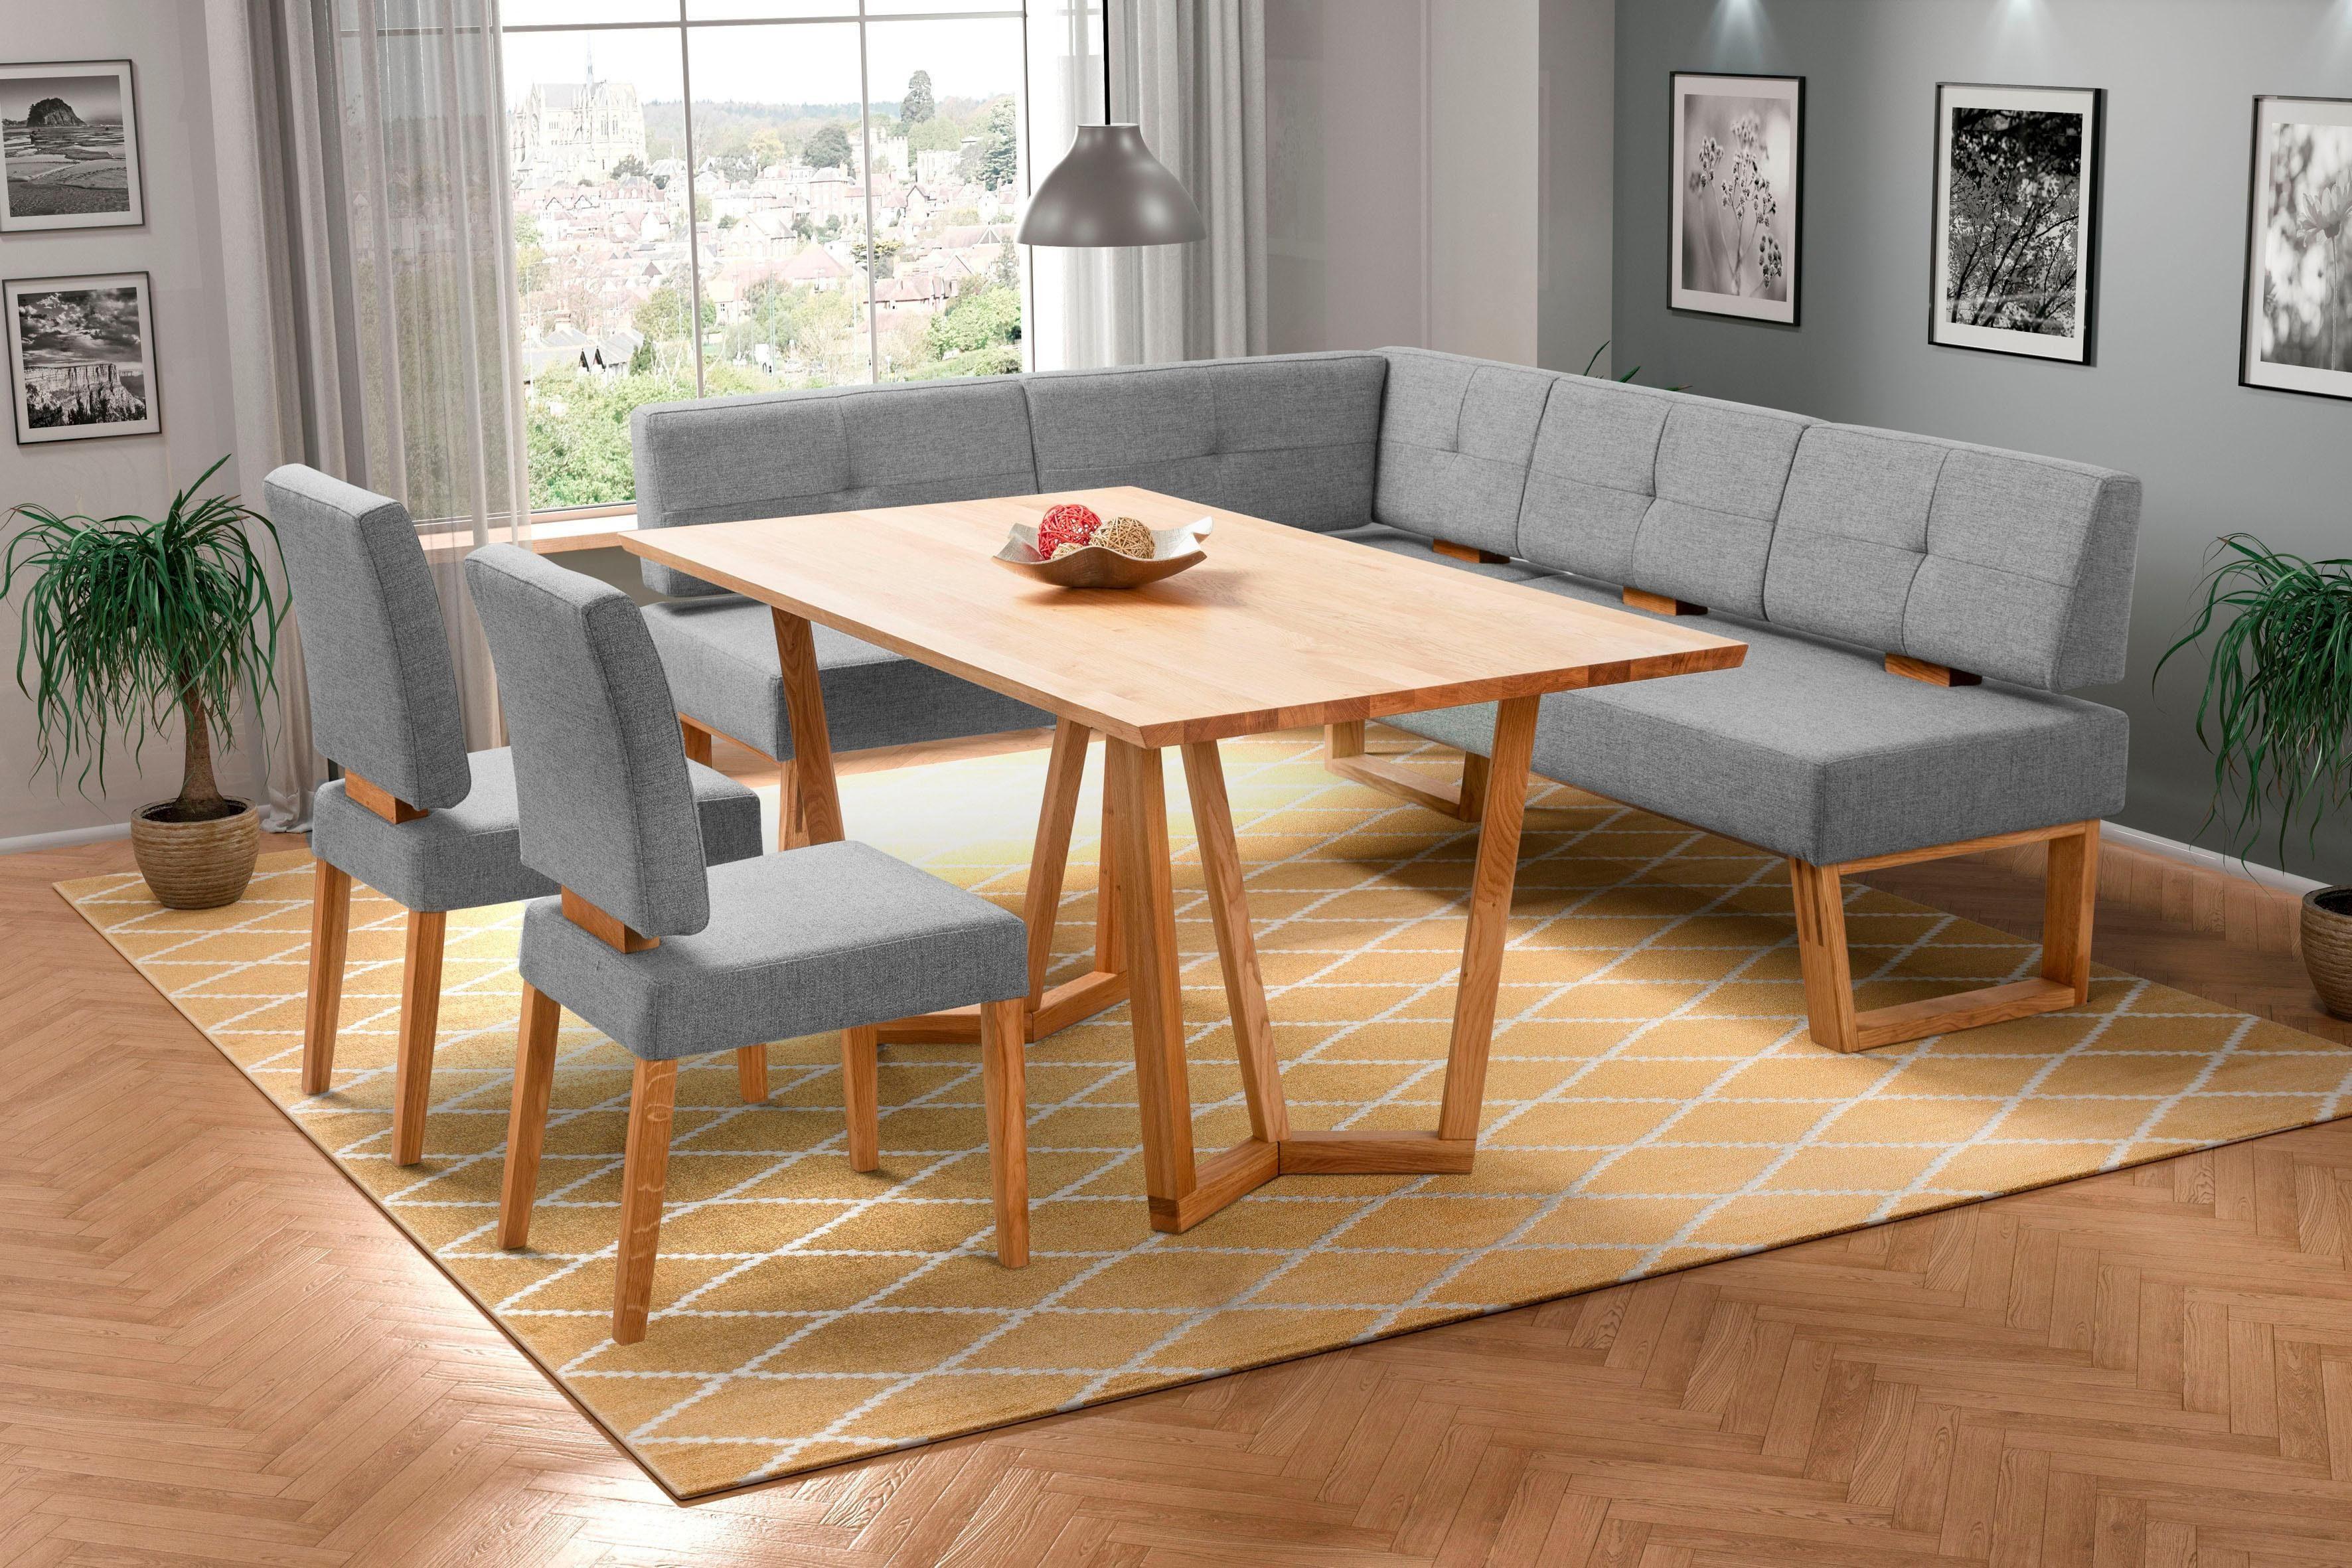 Eckbankgruppe Ponza (Set 4-tlg)   Küche und Esszimmer > Essgruppen > Eckbankgruppen   Grau   Holz